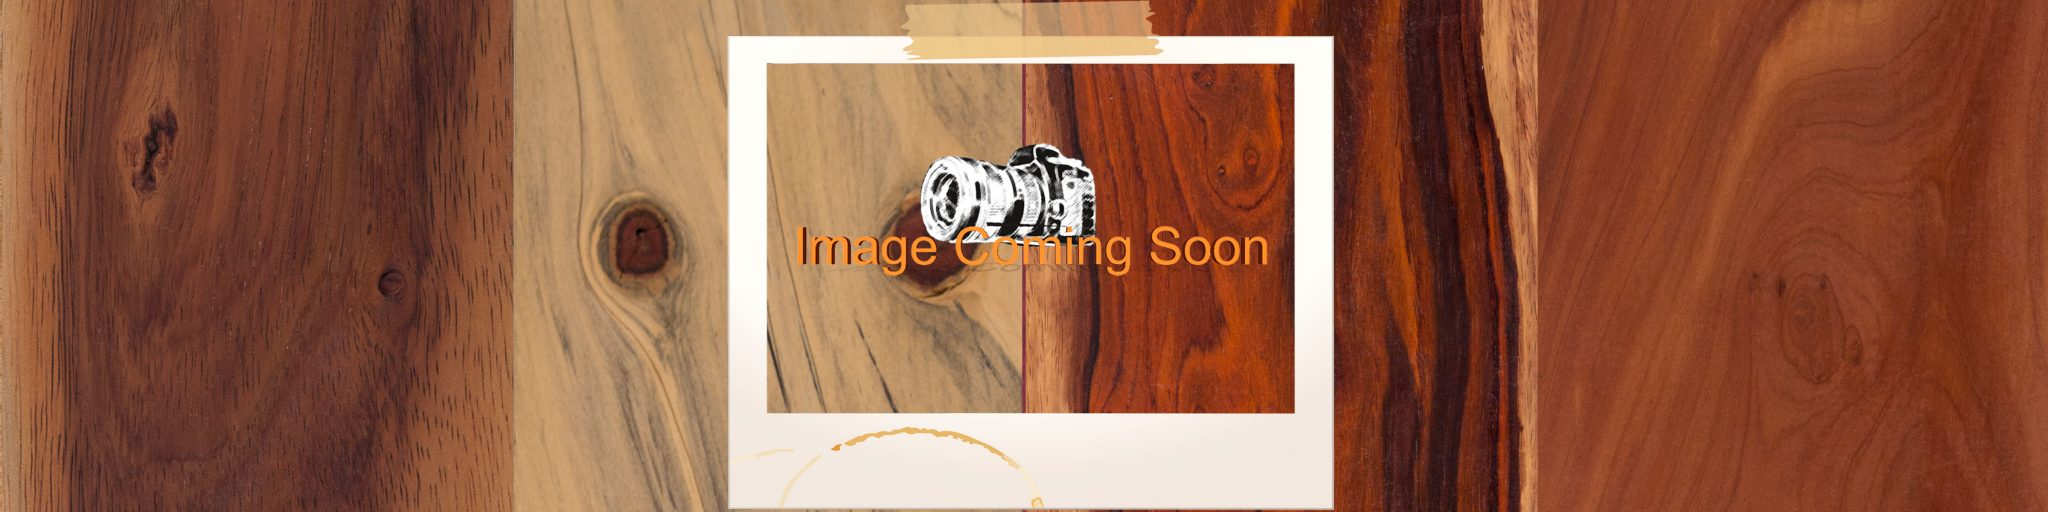 Wholesale Hard Curly Maple Hardwood Flooring